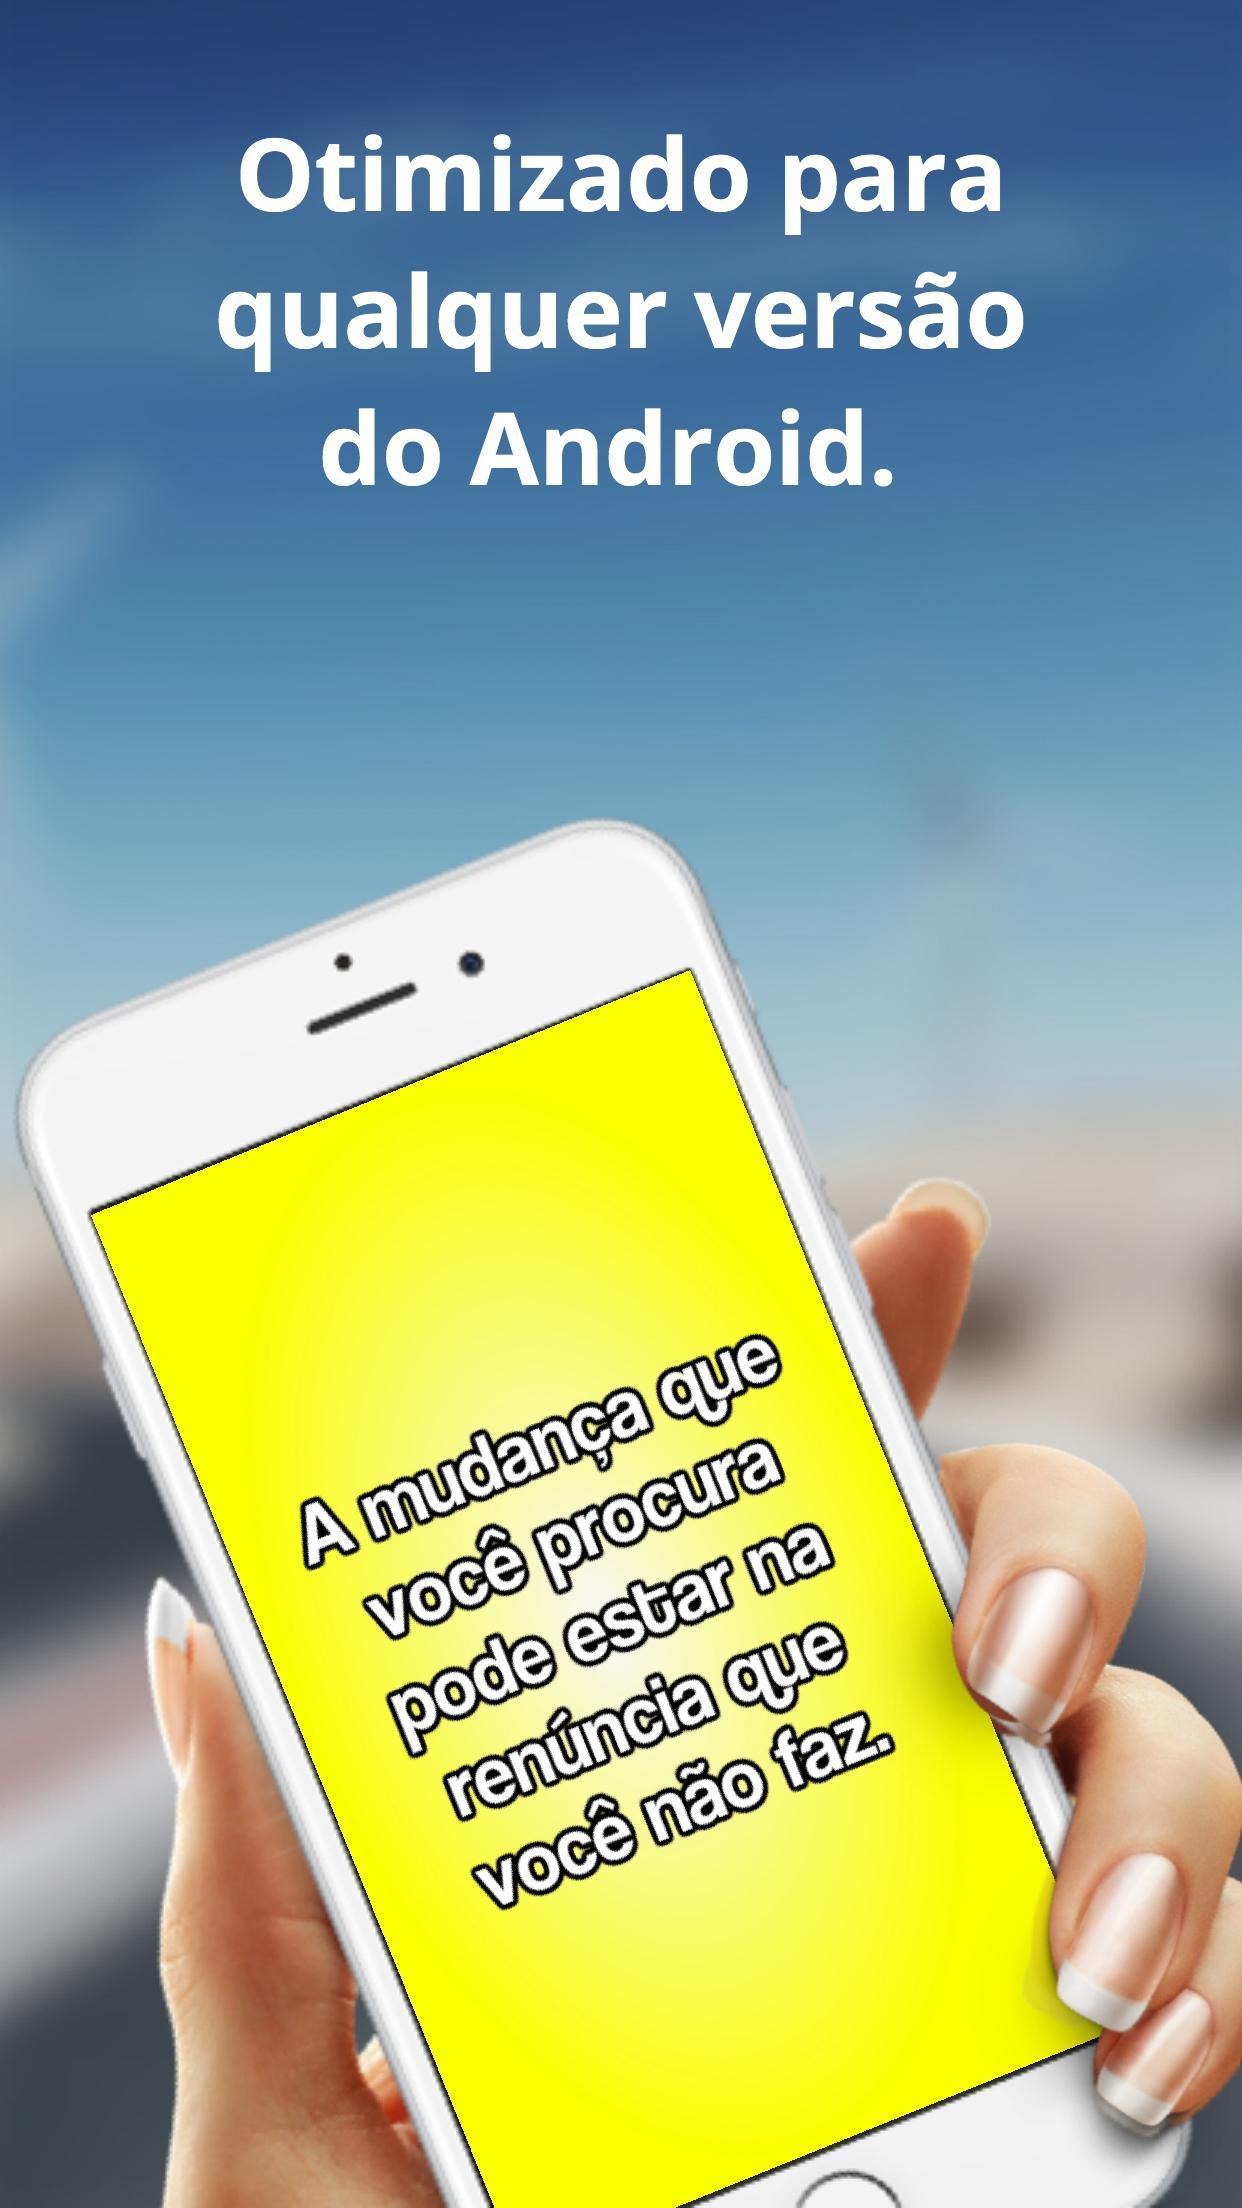 Frases De Mudança For Android Apk Download